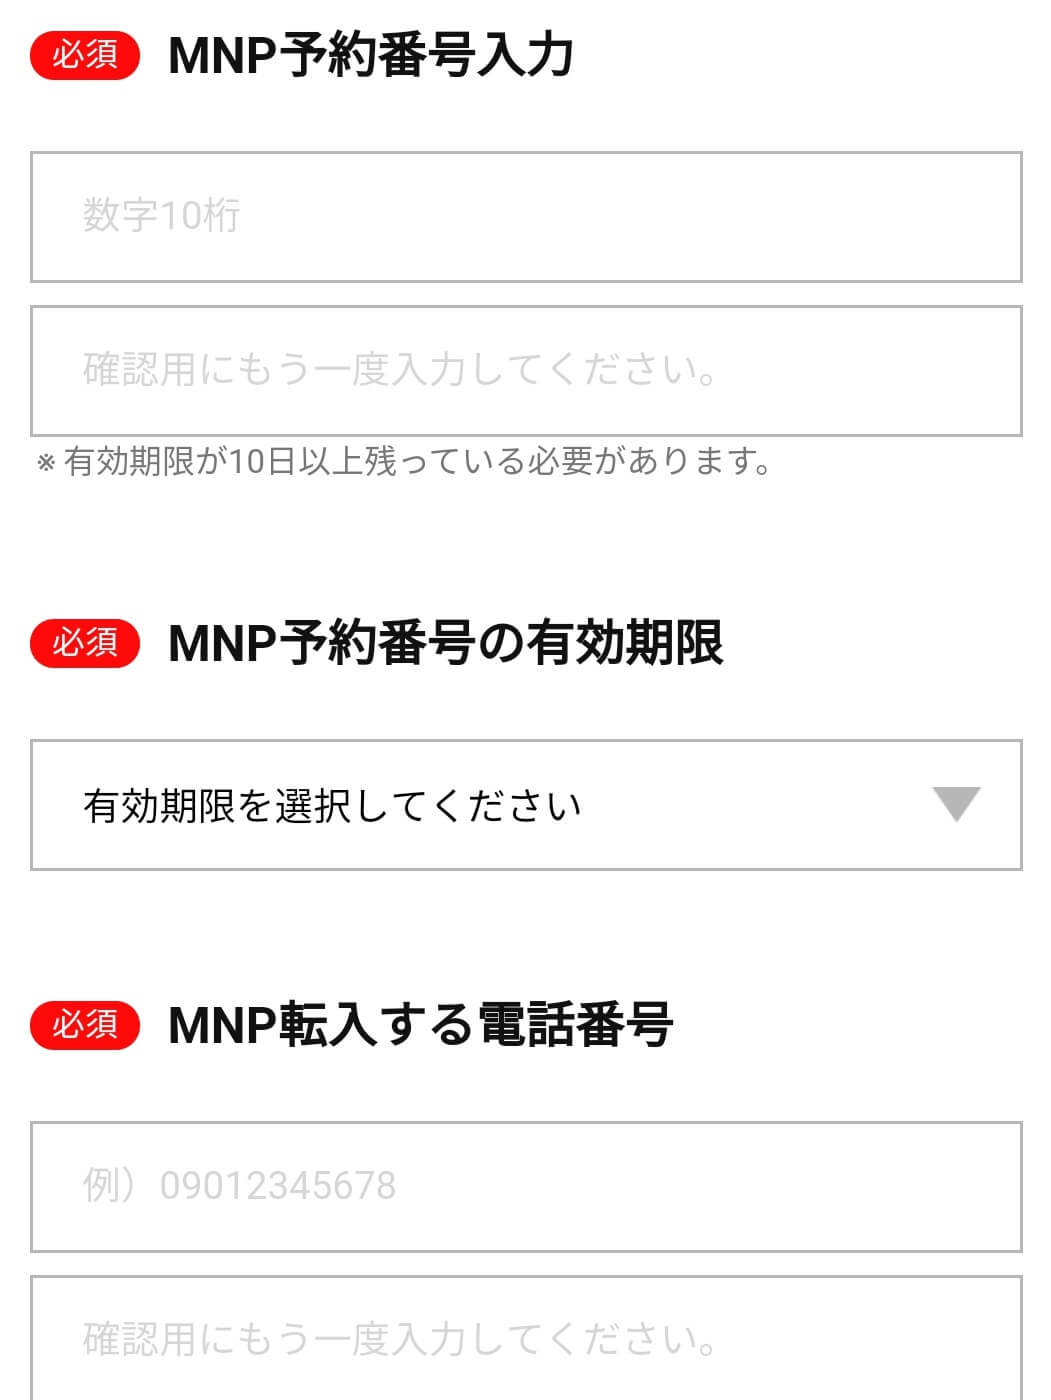 MNP予約番号、有効期限、引き継ぐ電話番号を入力